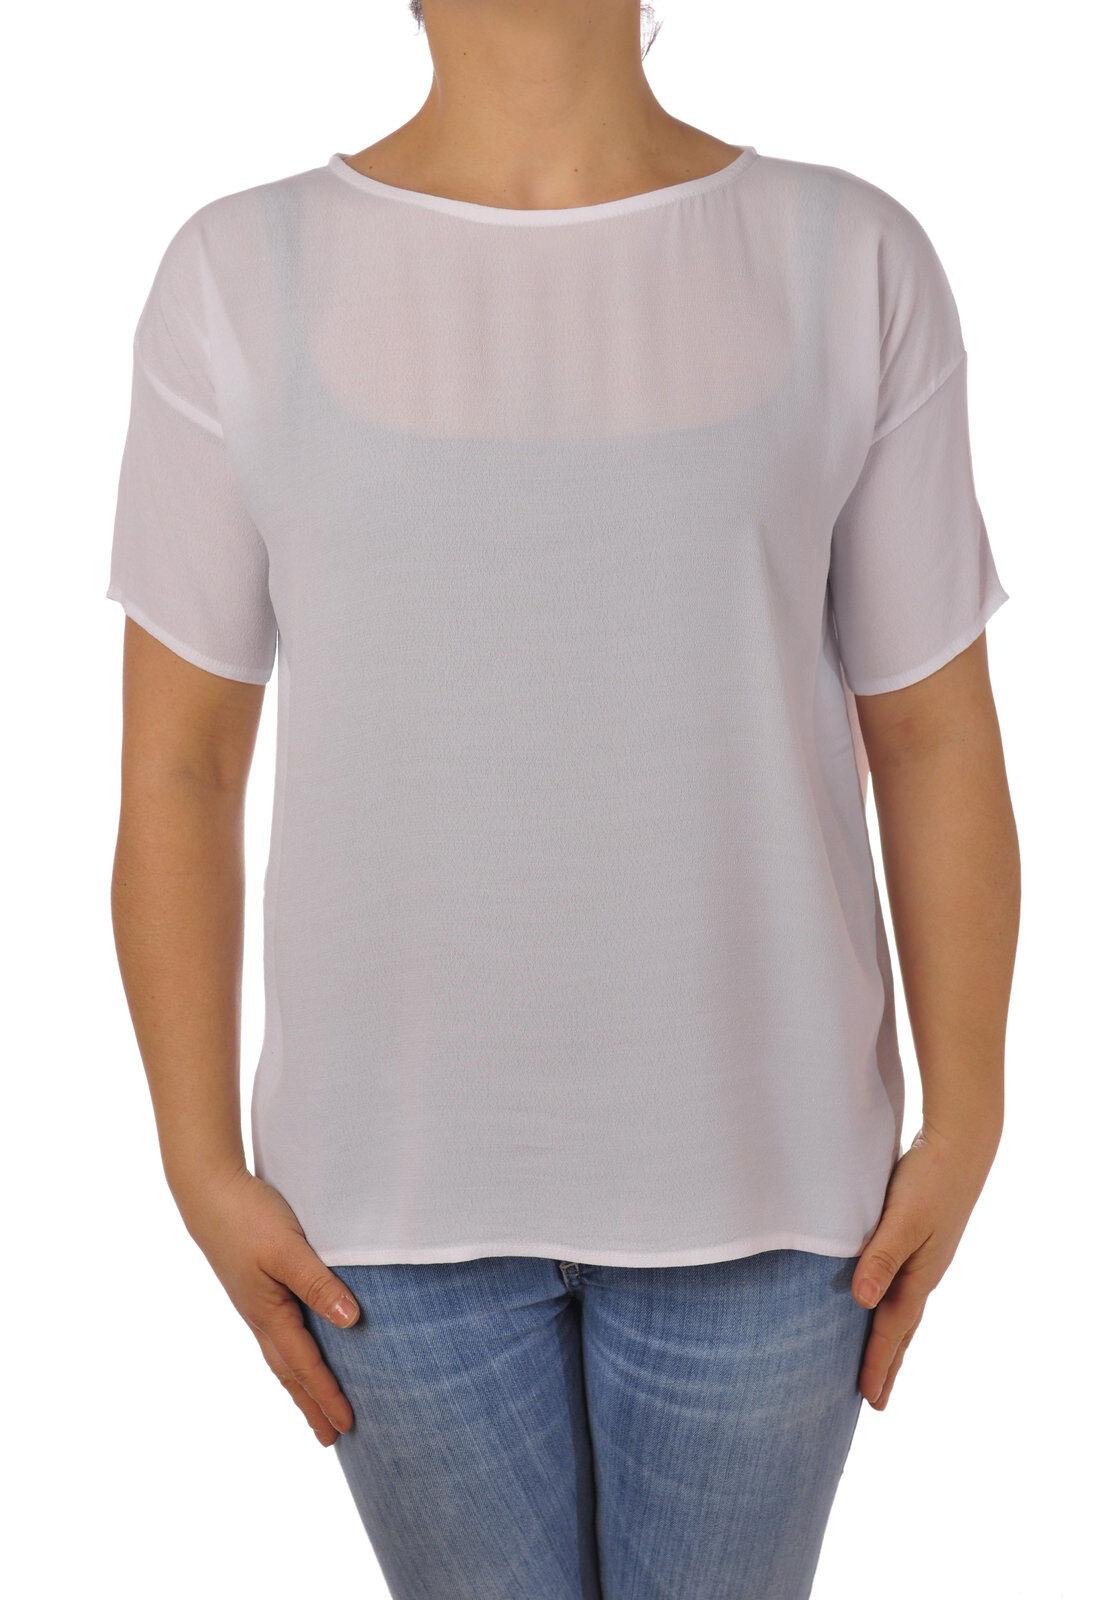 CROSSLEY - Camicie-Blause - damen - Bianco - 5087020F183834